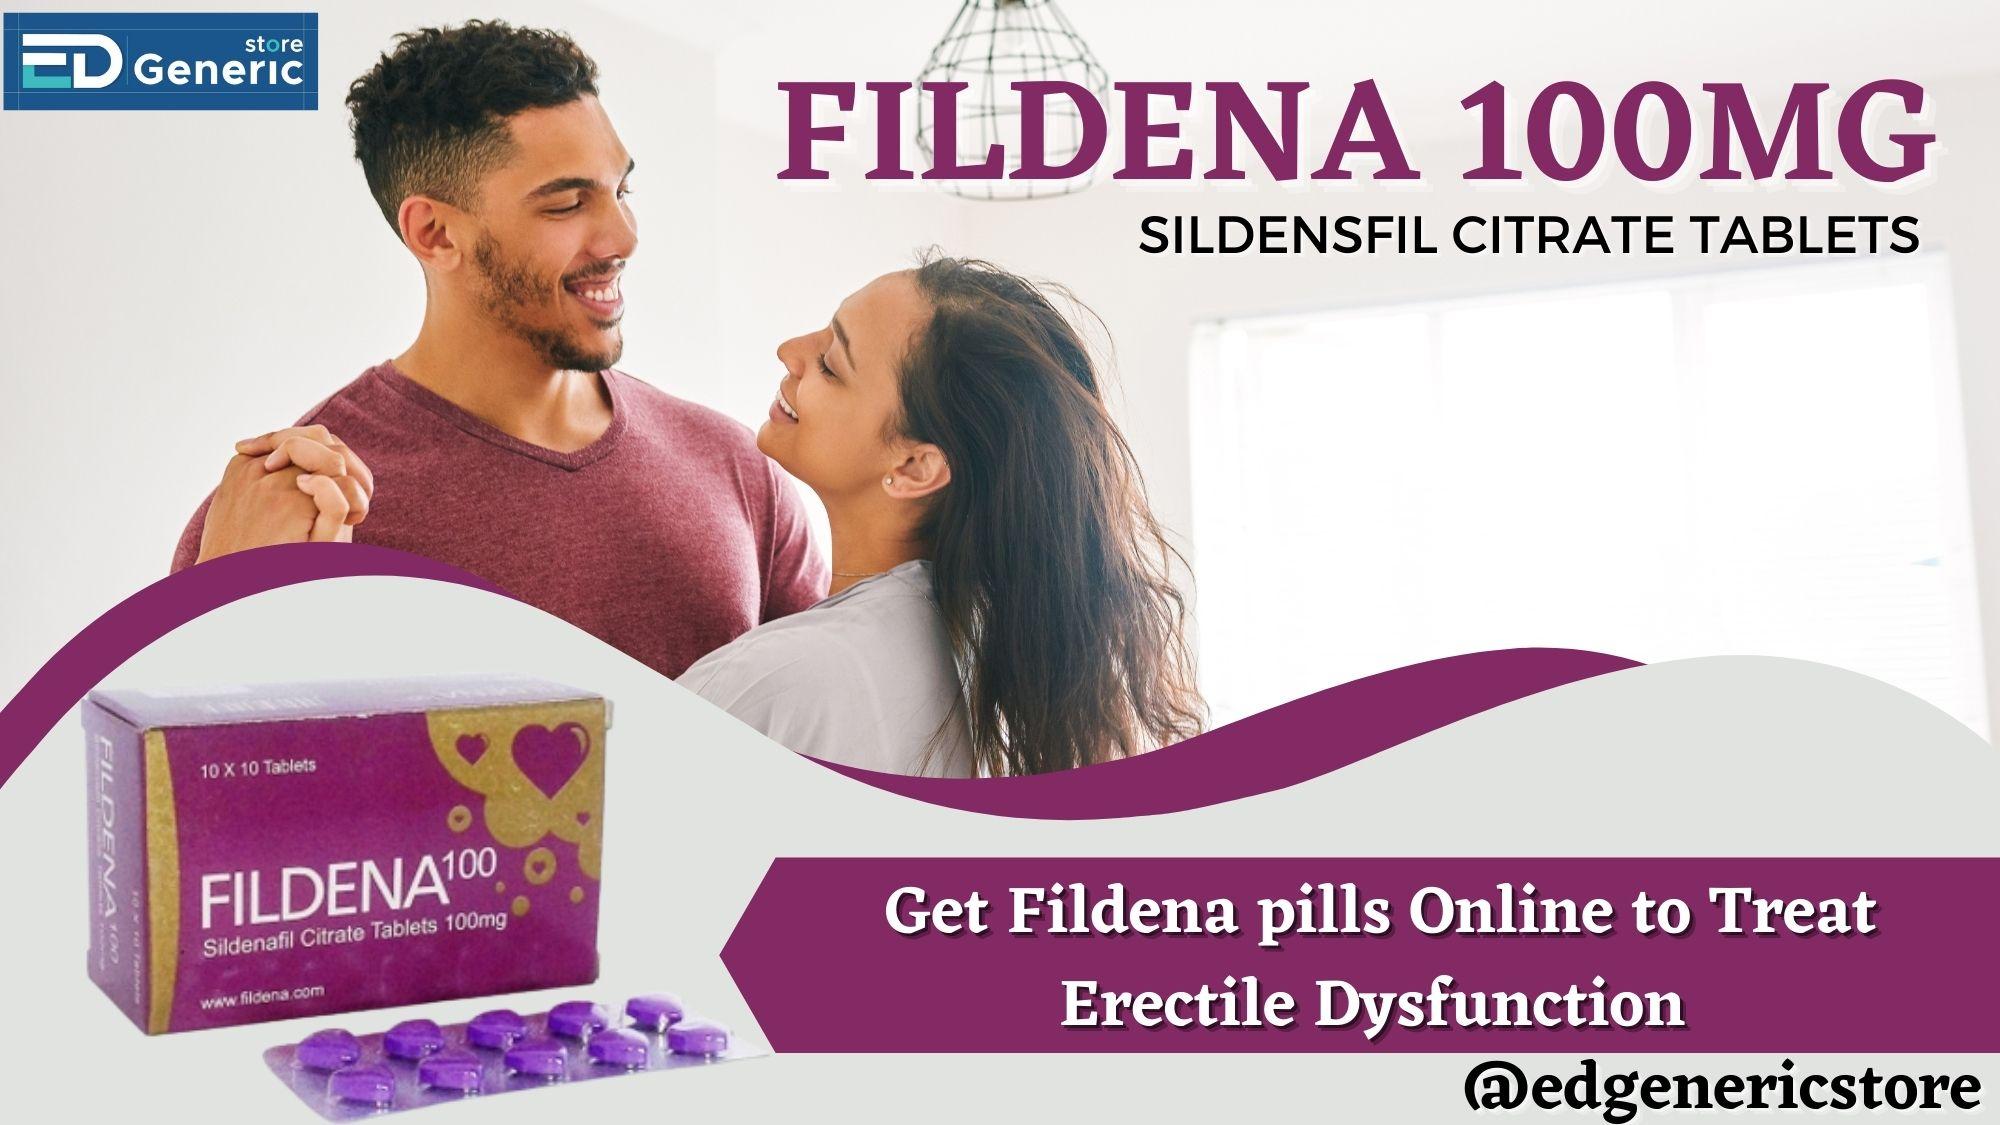 Get Fildena pills Online at Ed generic store